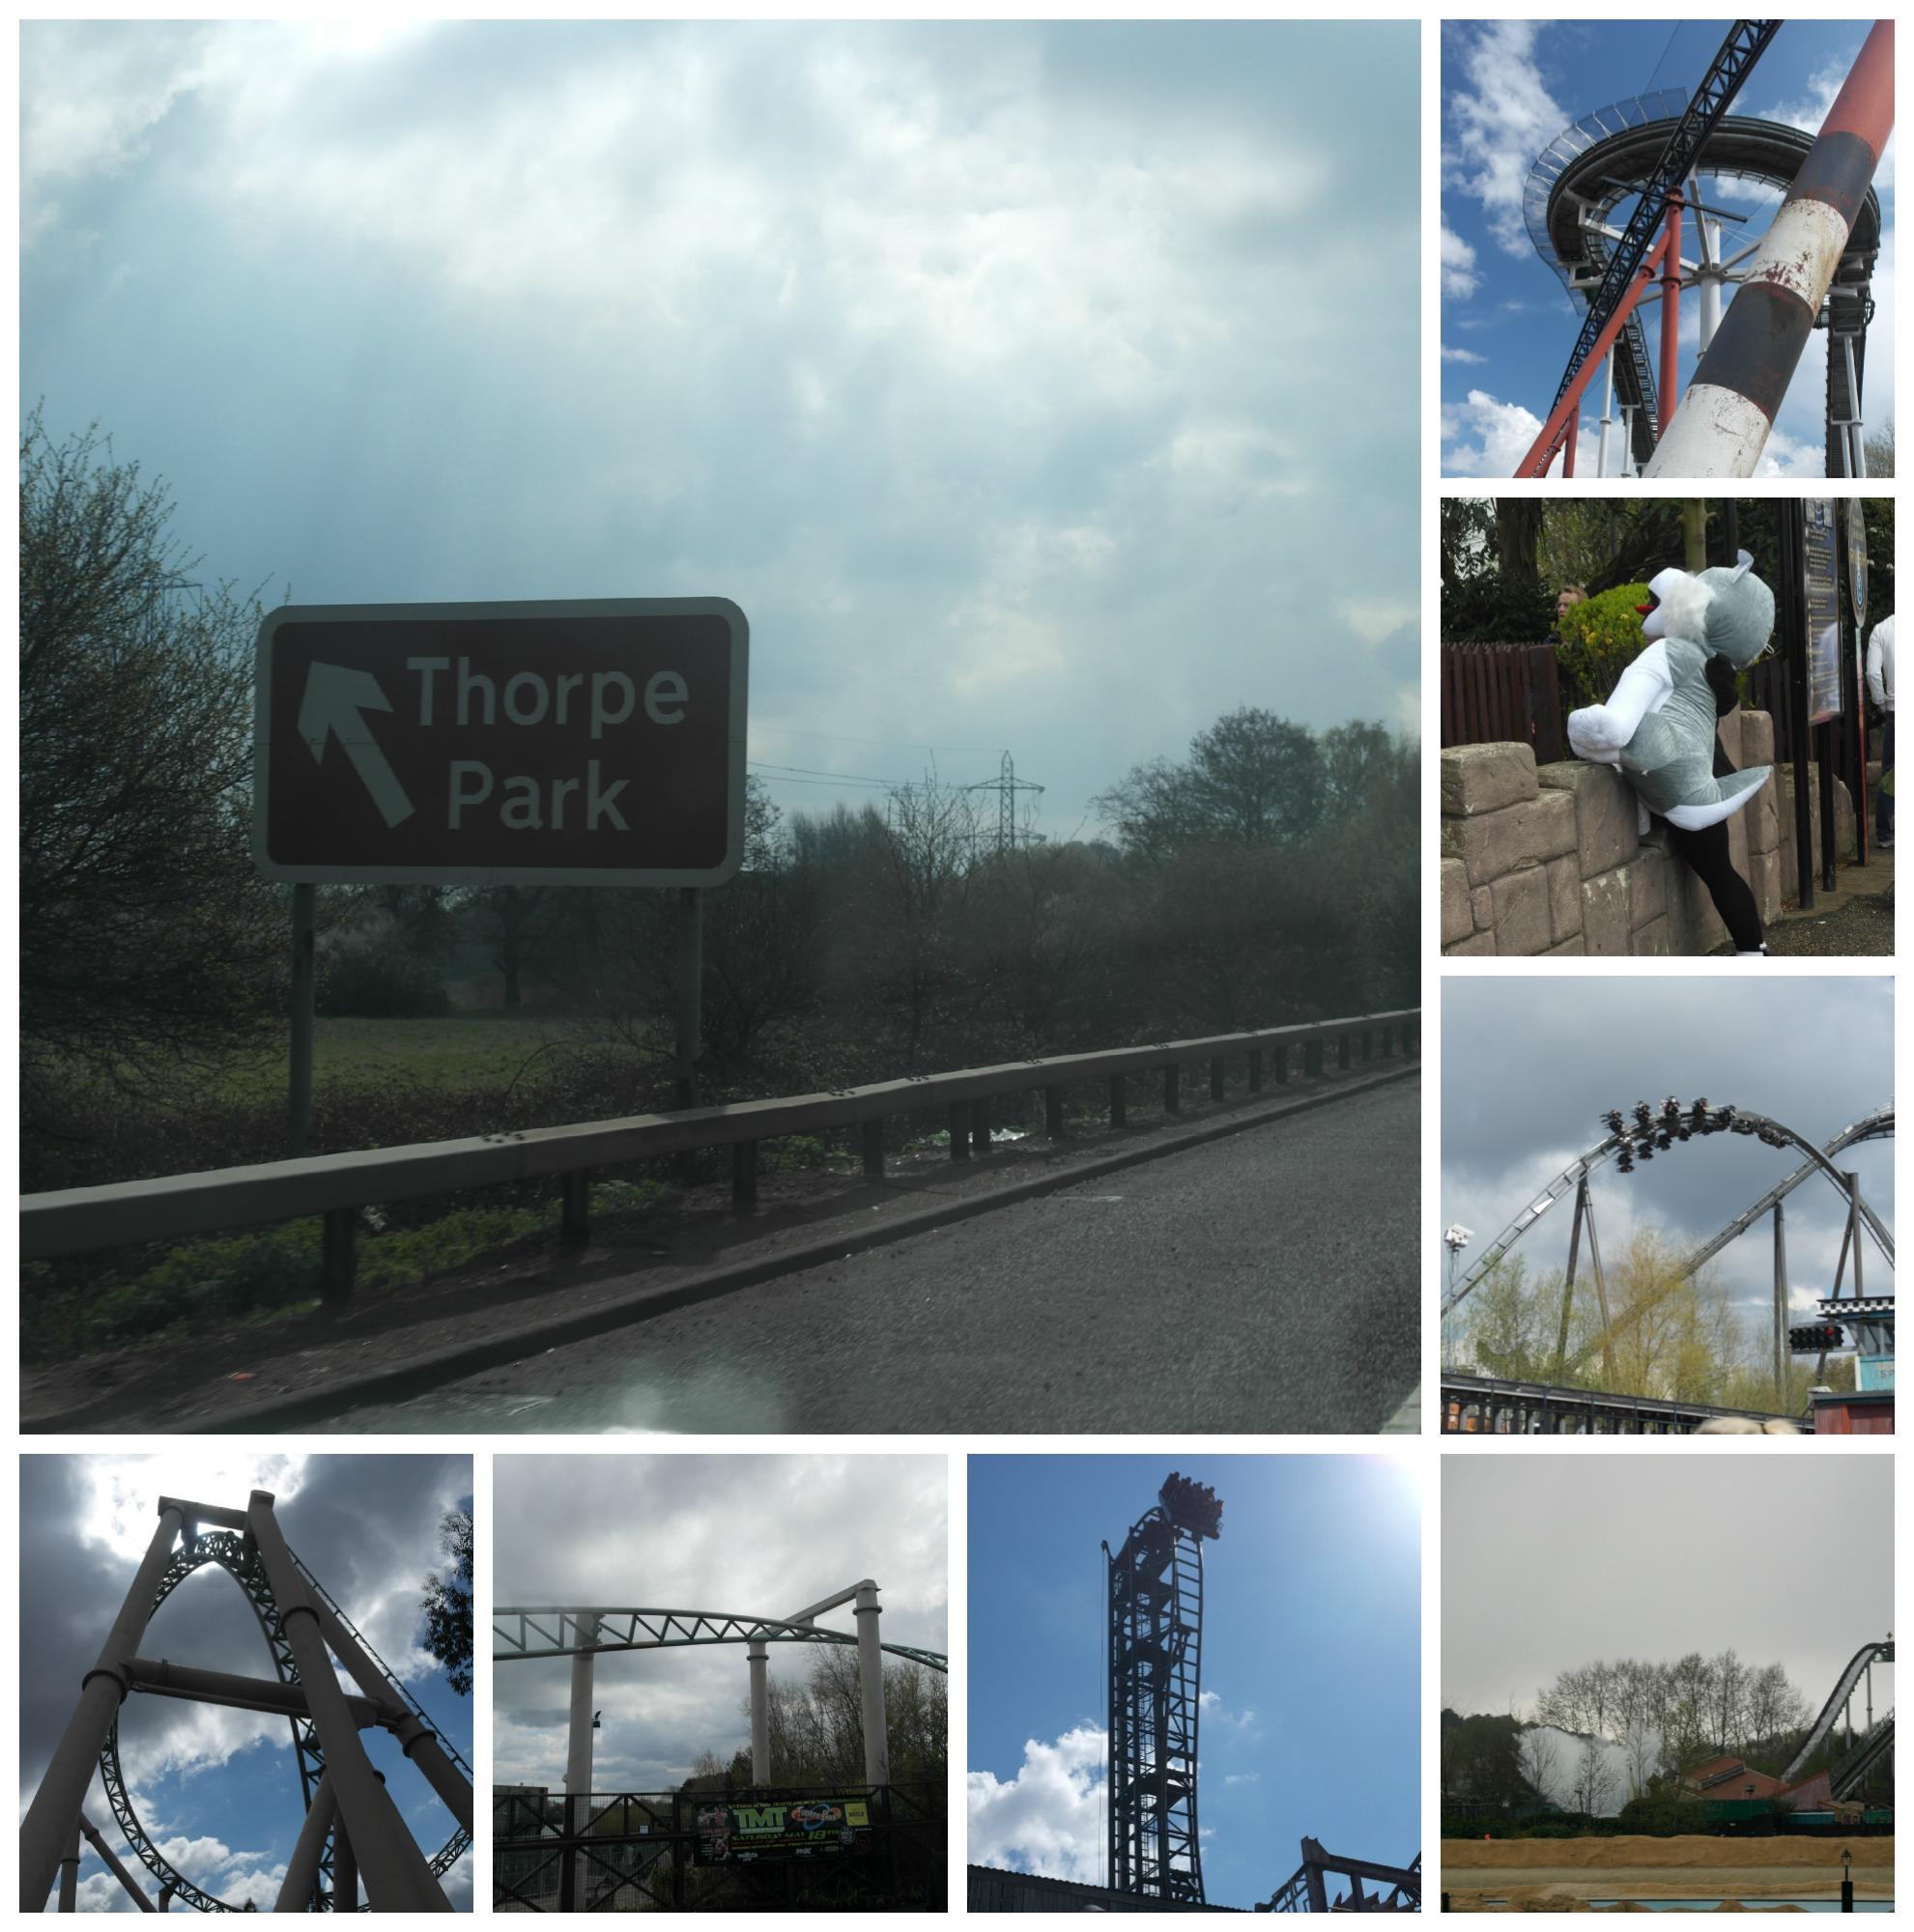 ThorpePark1